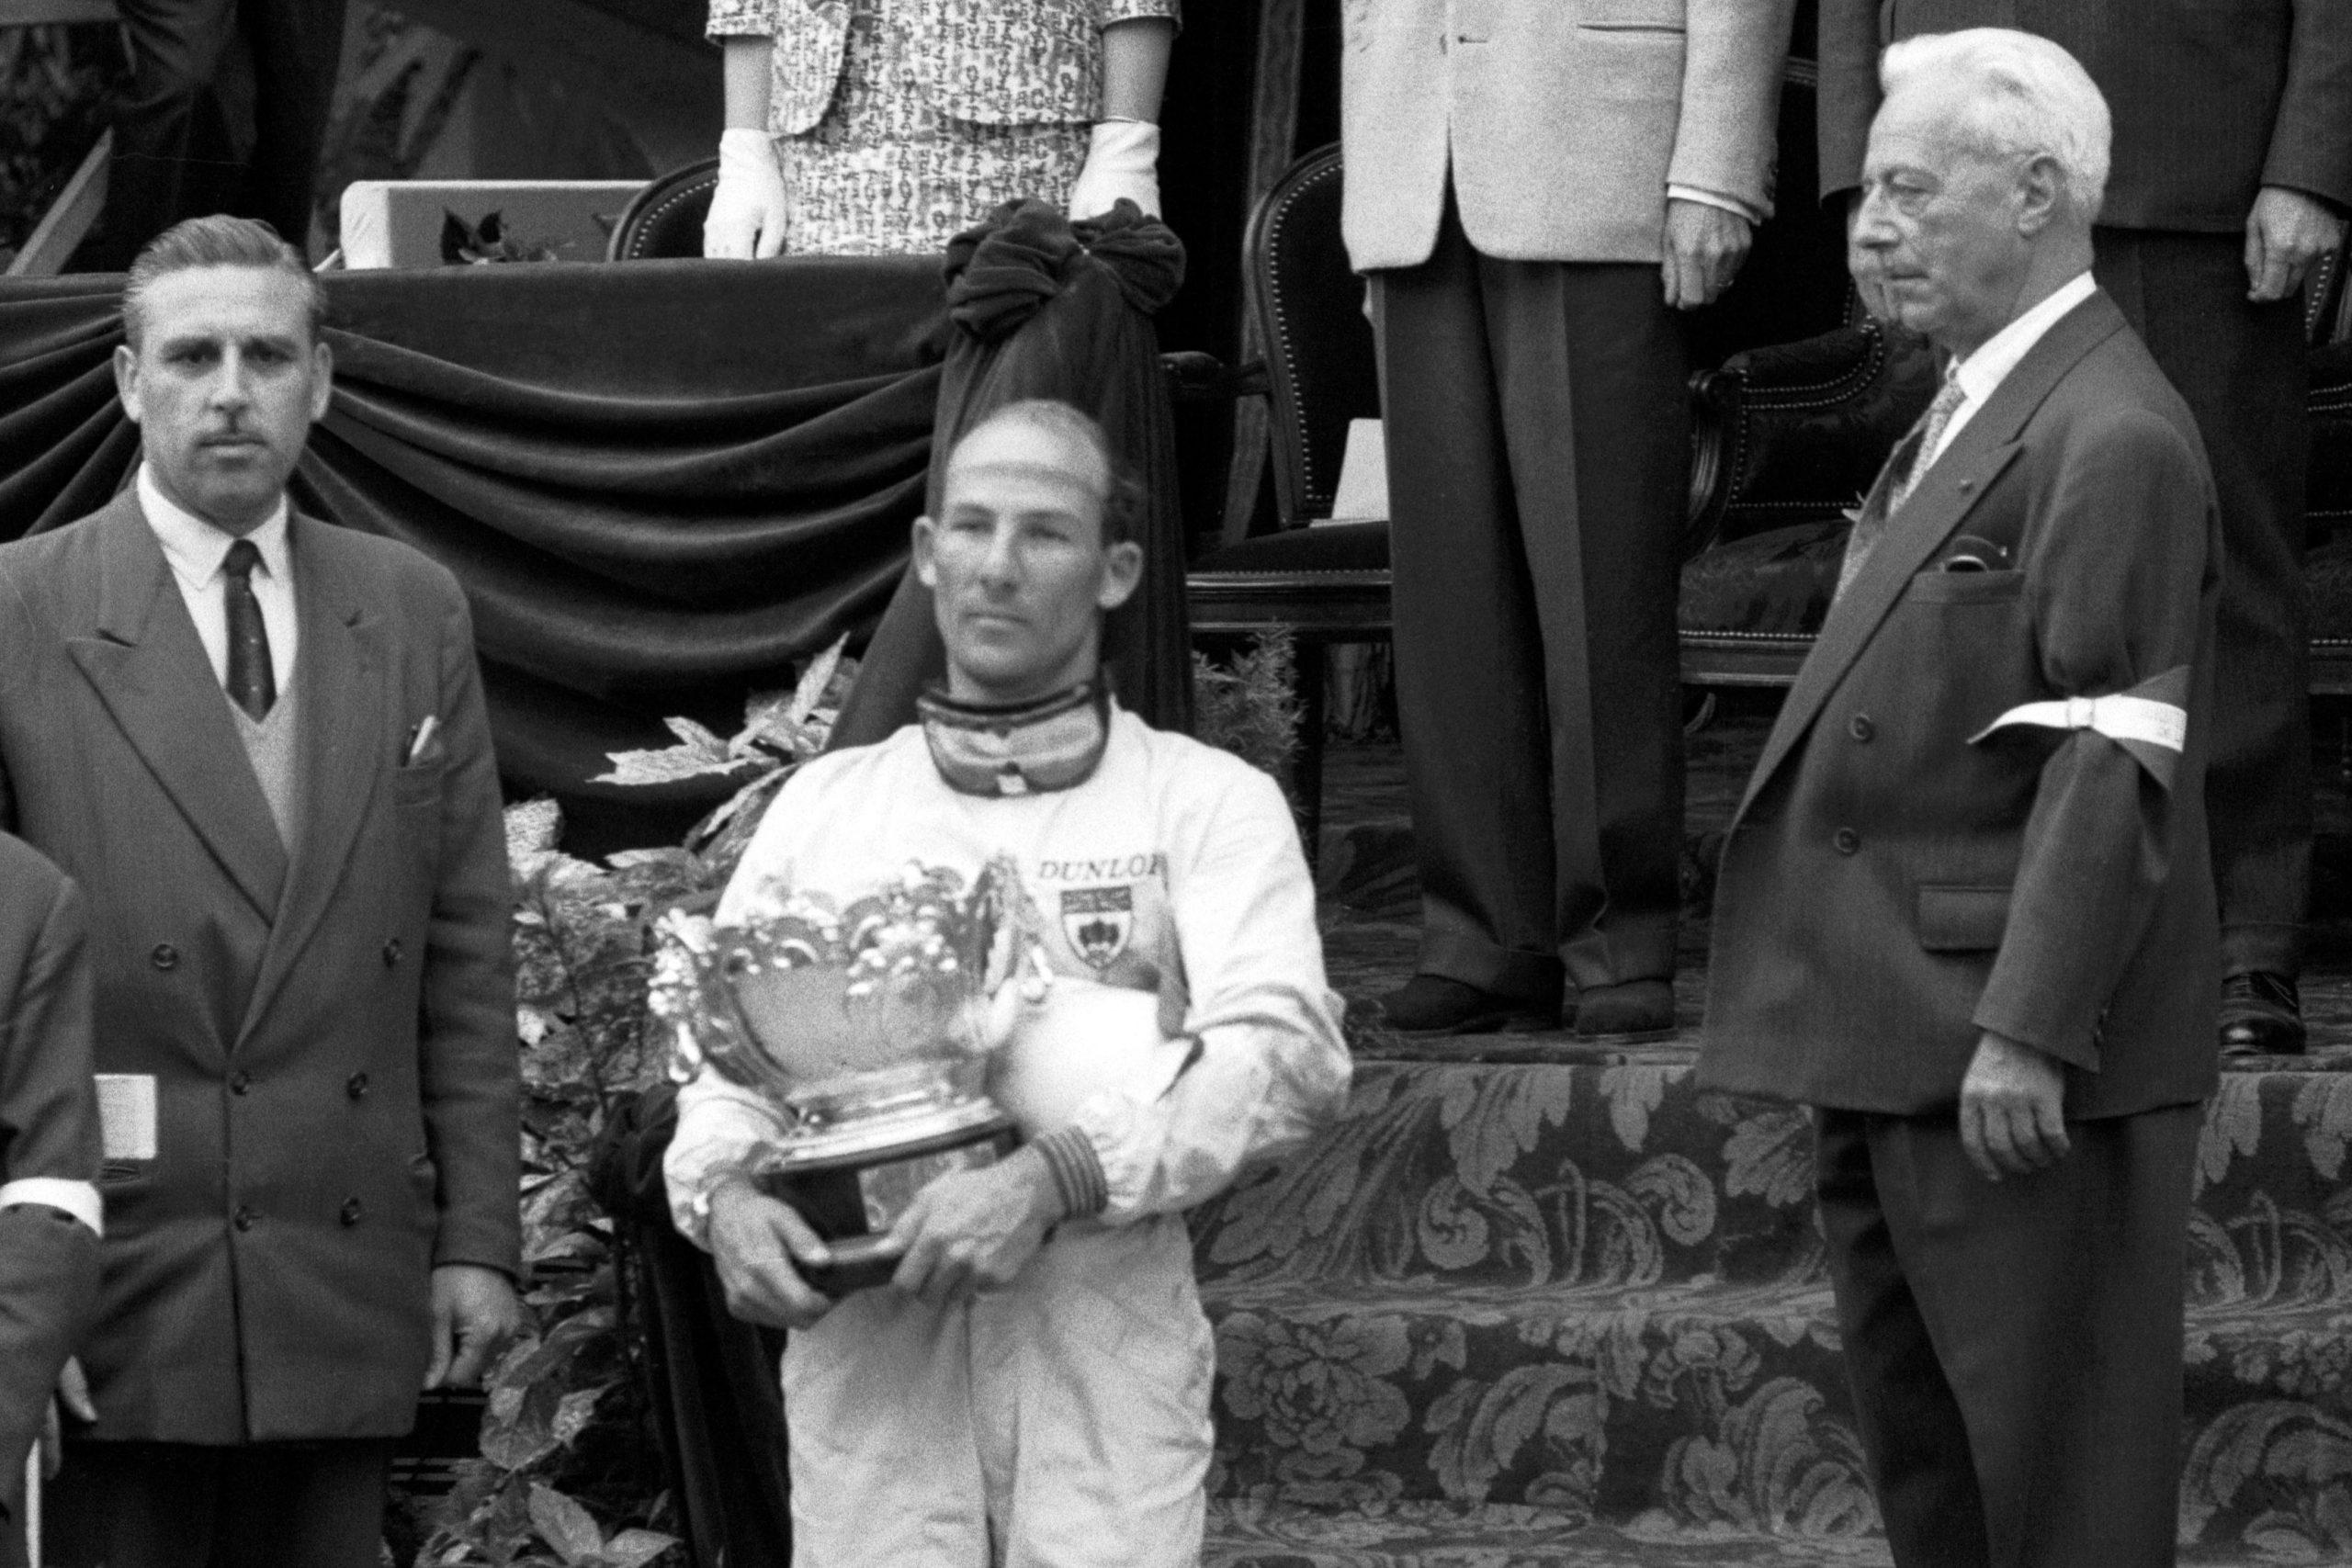 Race winner Stirling Moss on the podium.